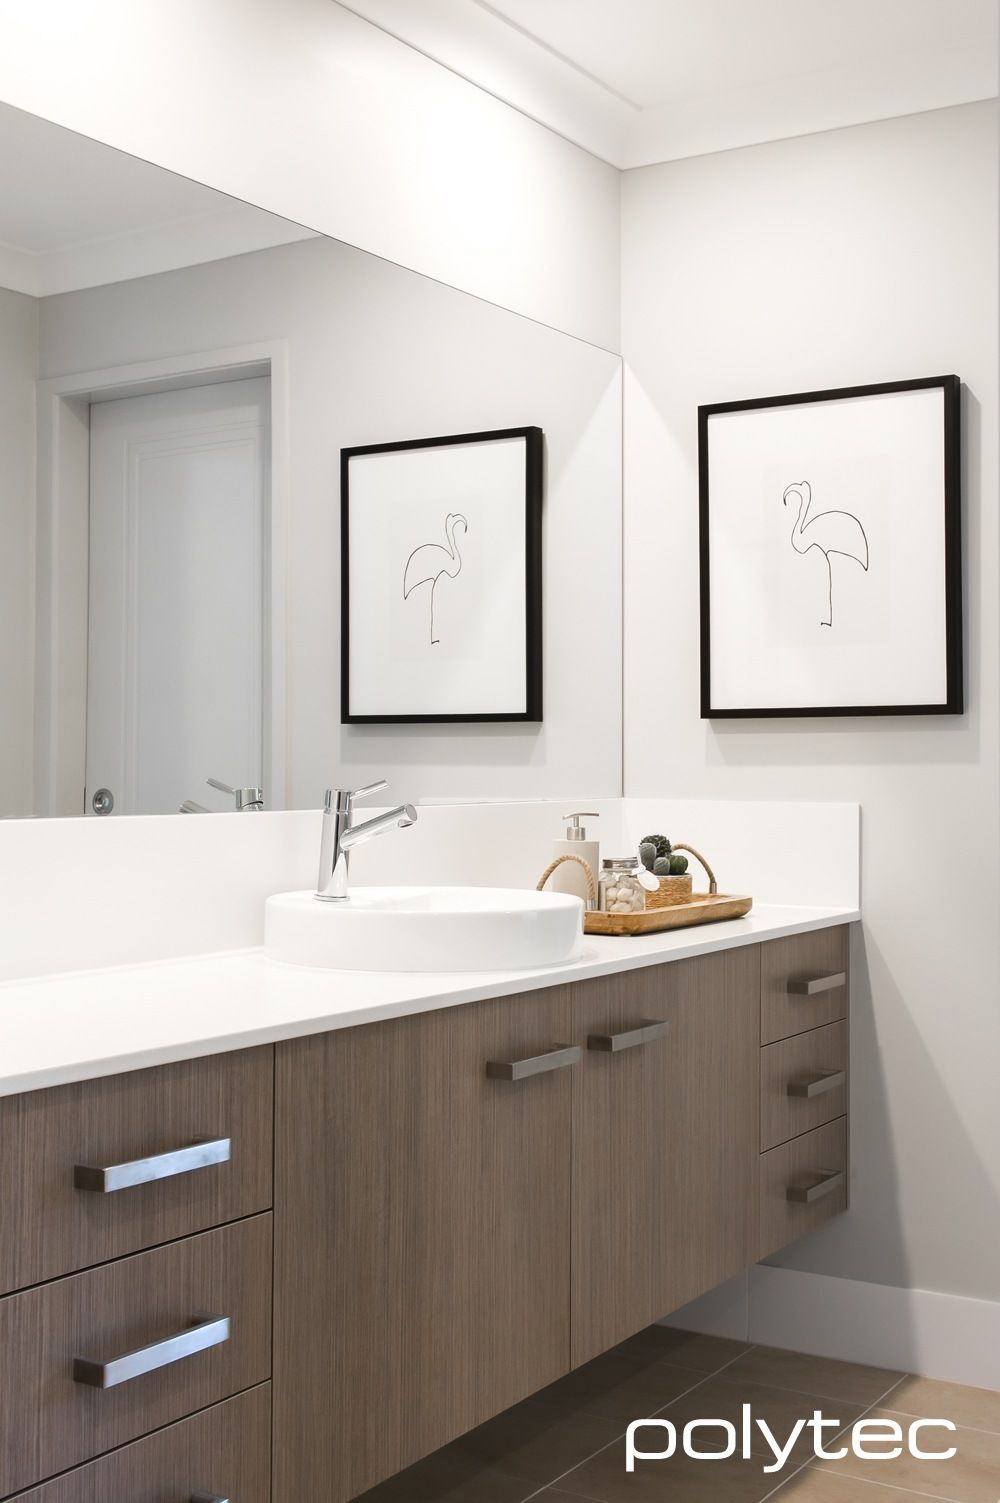 Stylish bathroom vanity in MELAMINE Tessuto Milan Matt. | Baths in ...